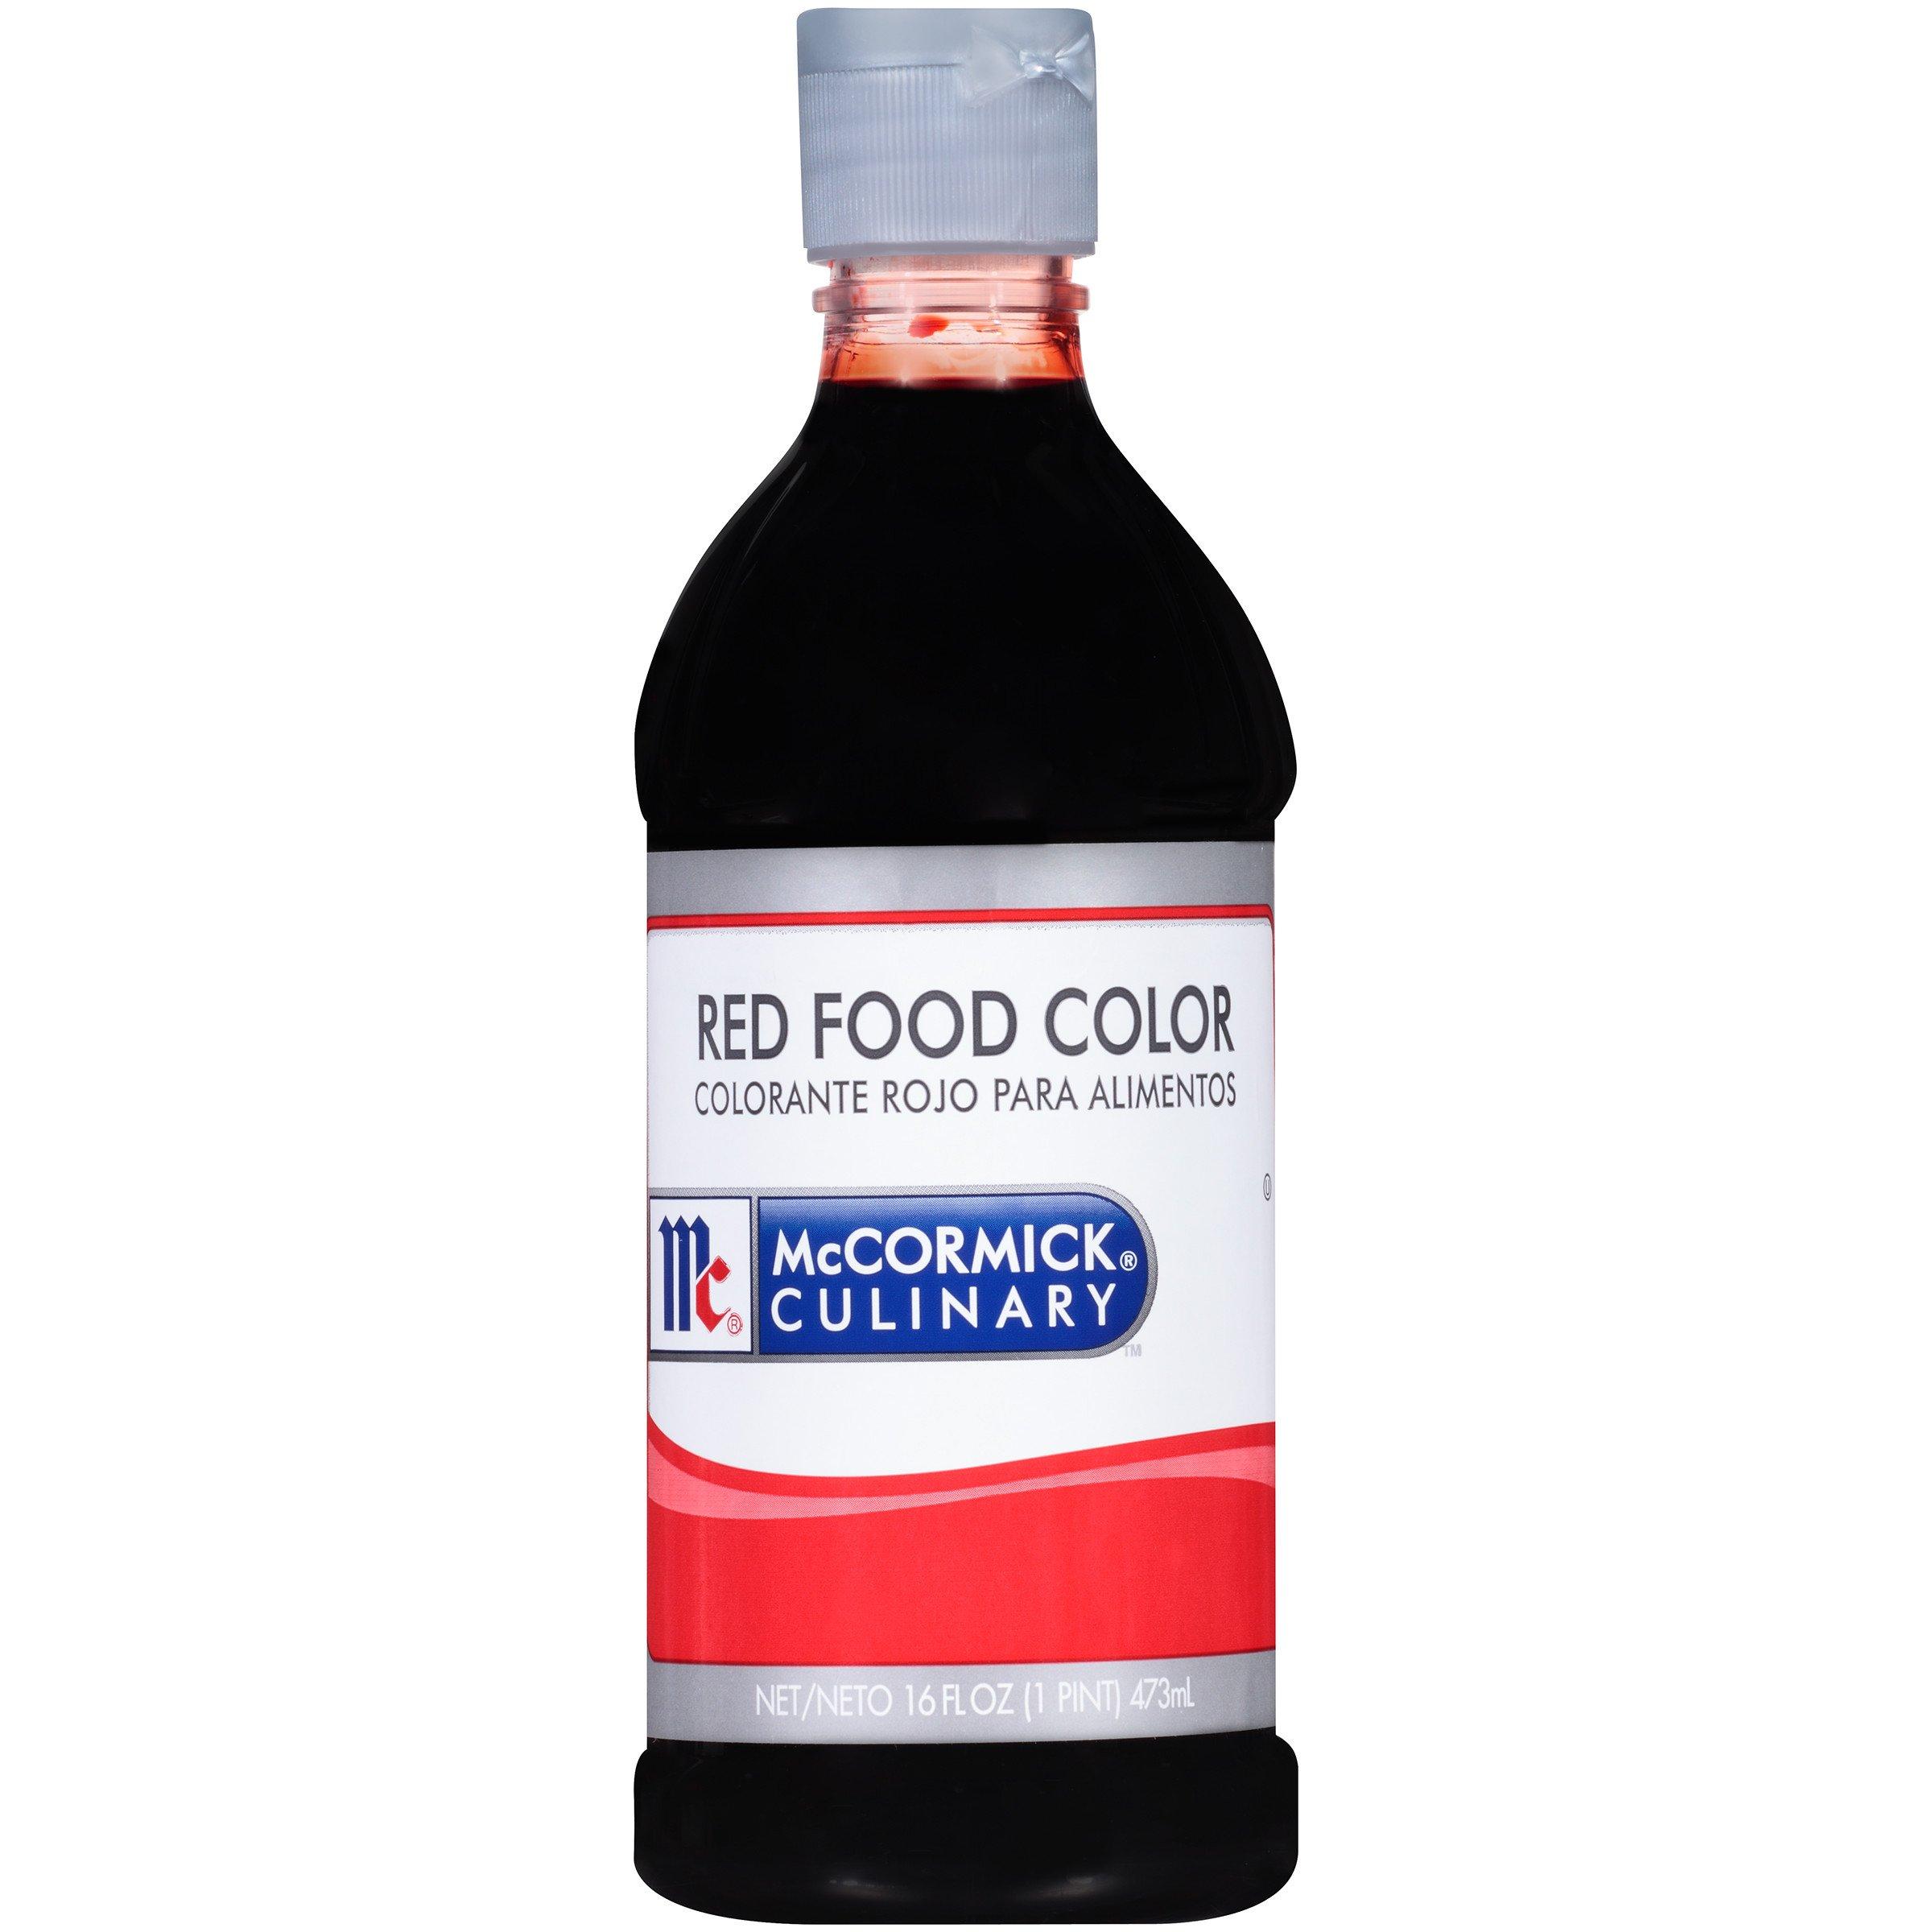 Emejing Black Food Coloring Photos - Style and Ideas - rewordio.us